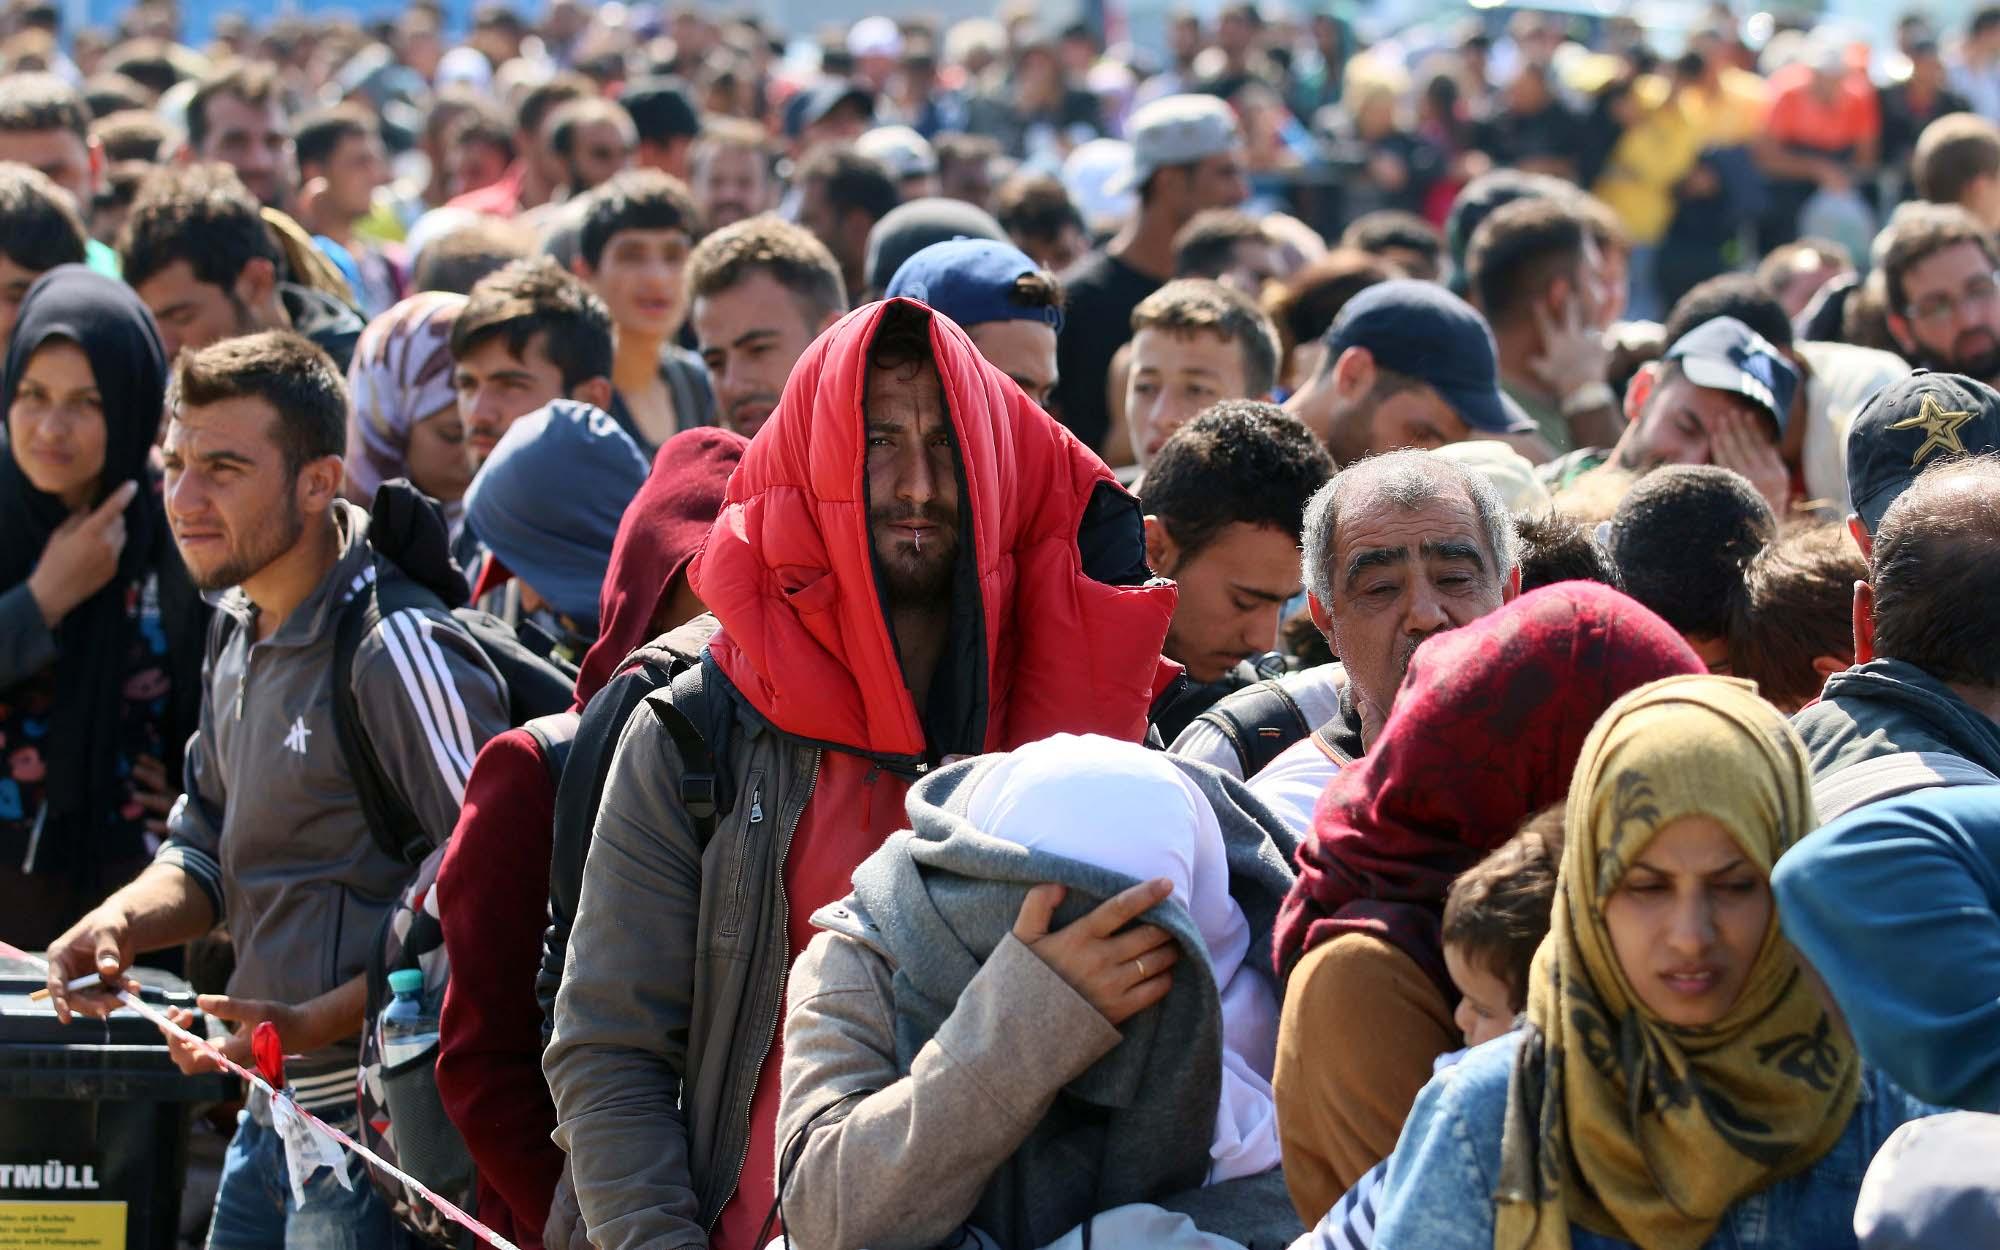 ISIS: Jihadists are returning to Europe